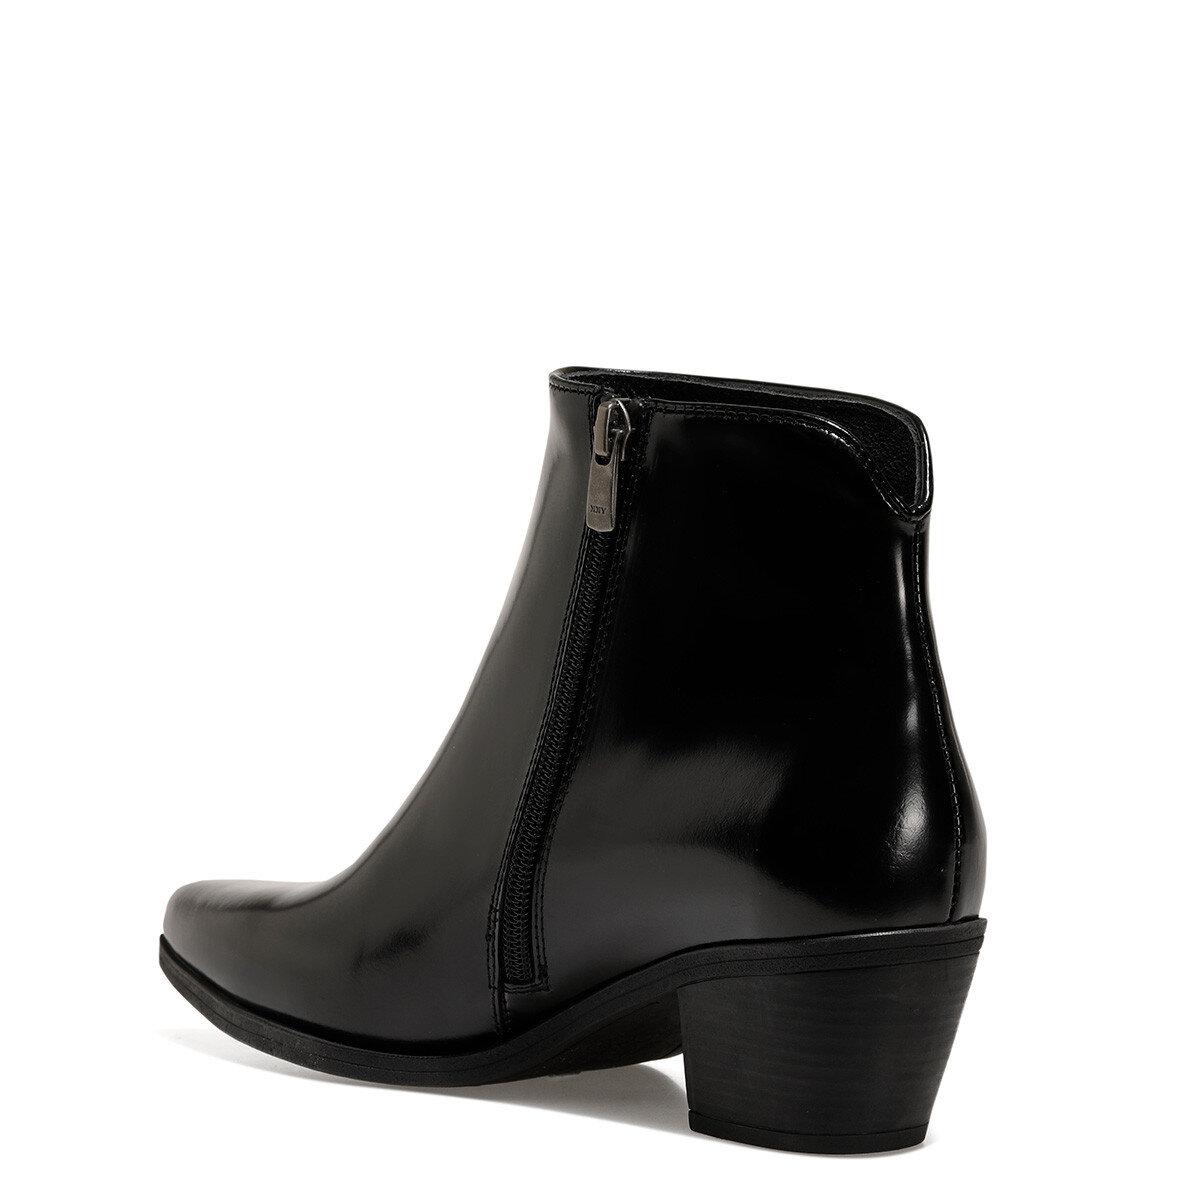 RHO Siyah Kadın Topuklu Bot